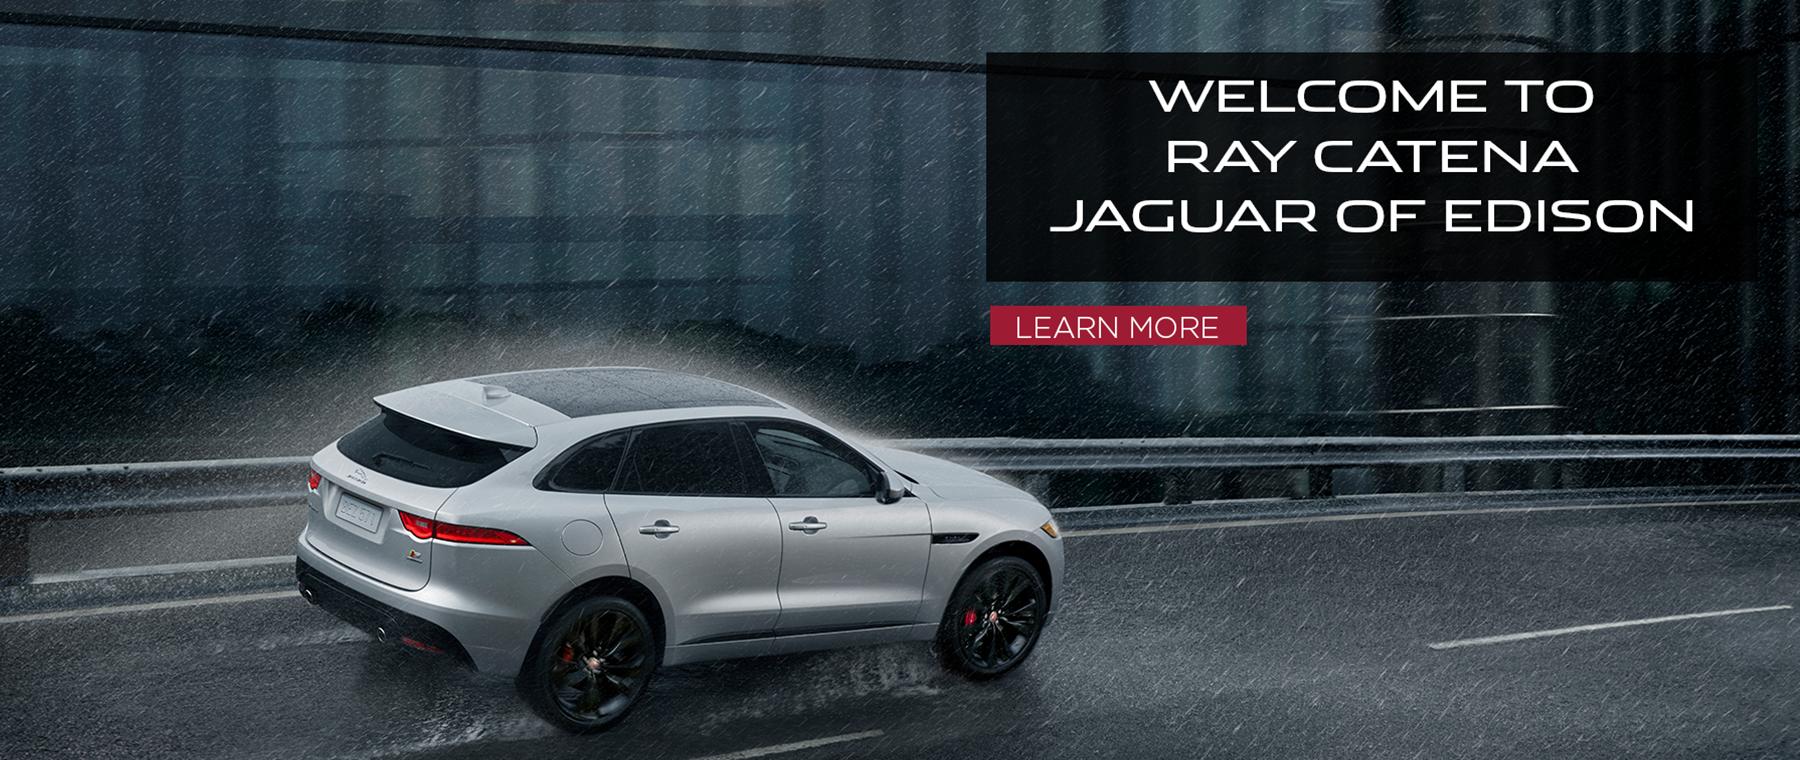 Ray Catena Jaguar >> Jaguar Dealership Edison Nj Ray Catena Jaguar